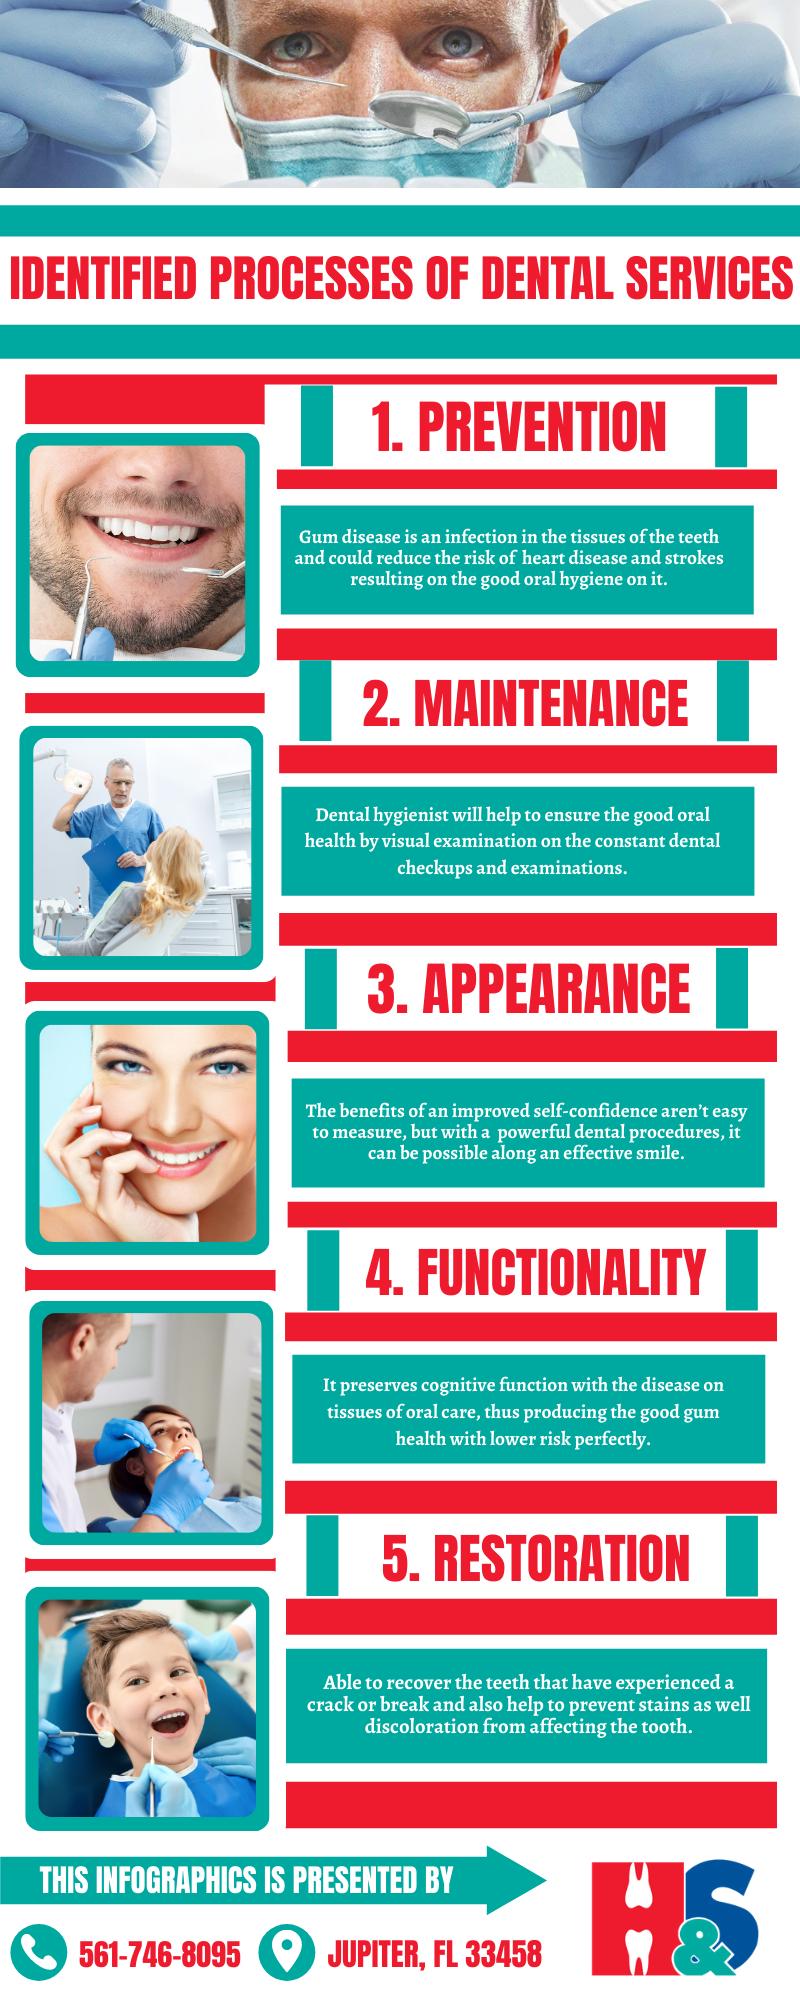 Premium Dental Treatments for Whiten Teeth